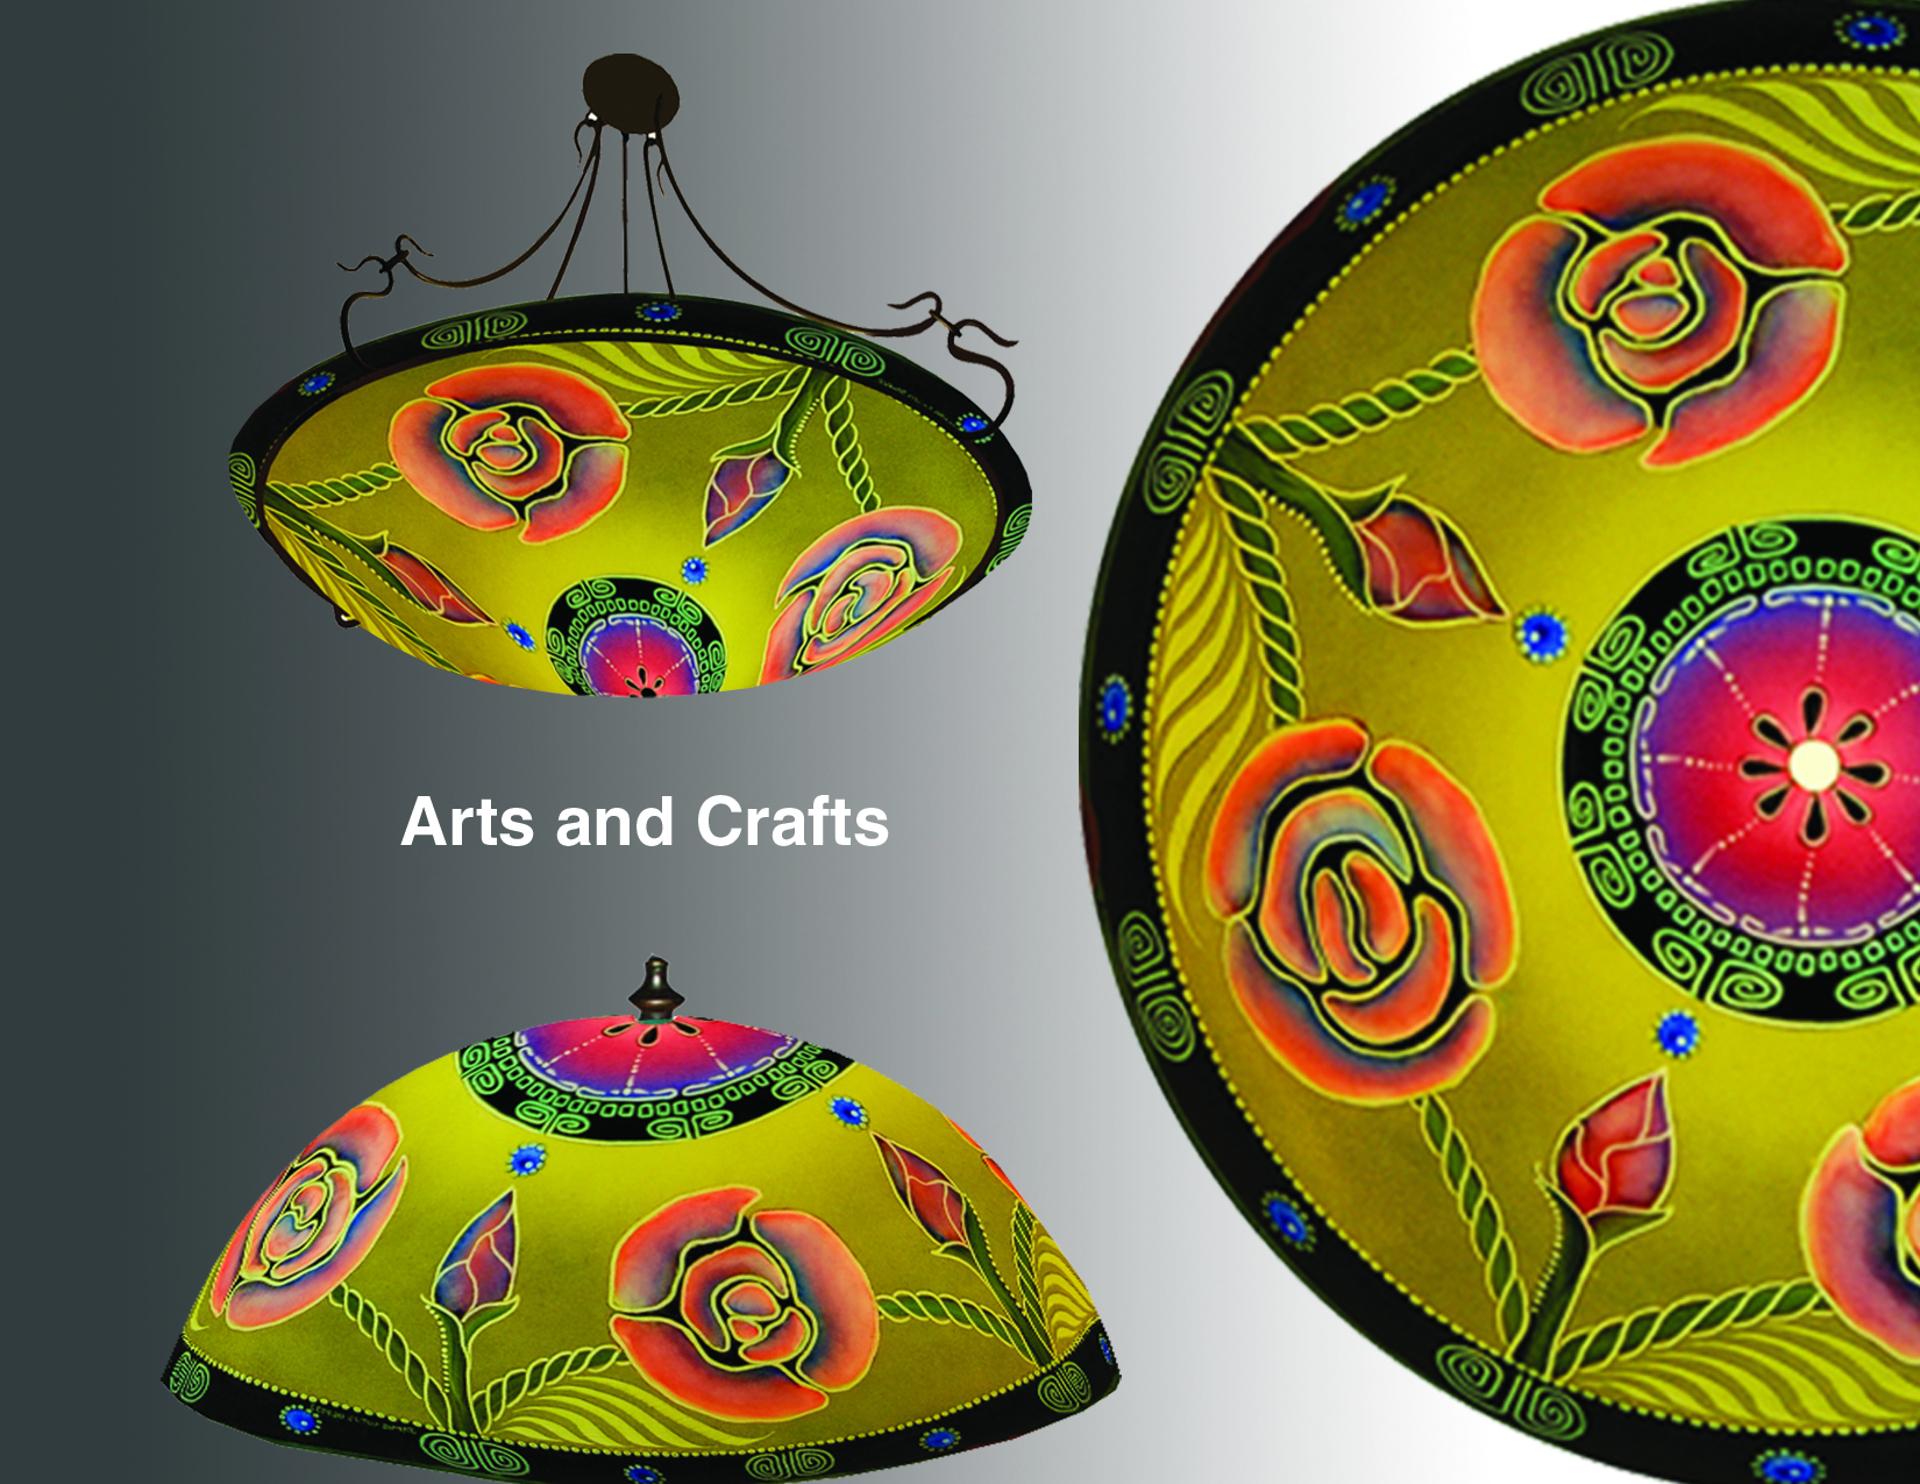 Design Arts & Crafts by Jamie Barthel